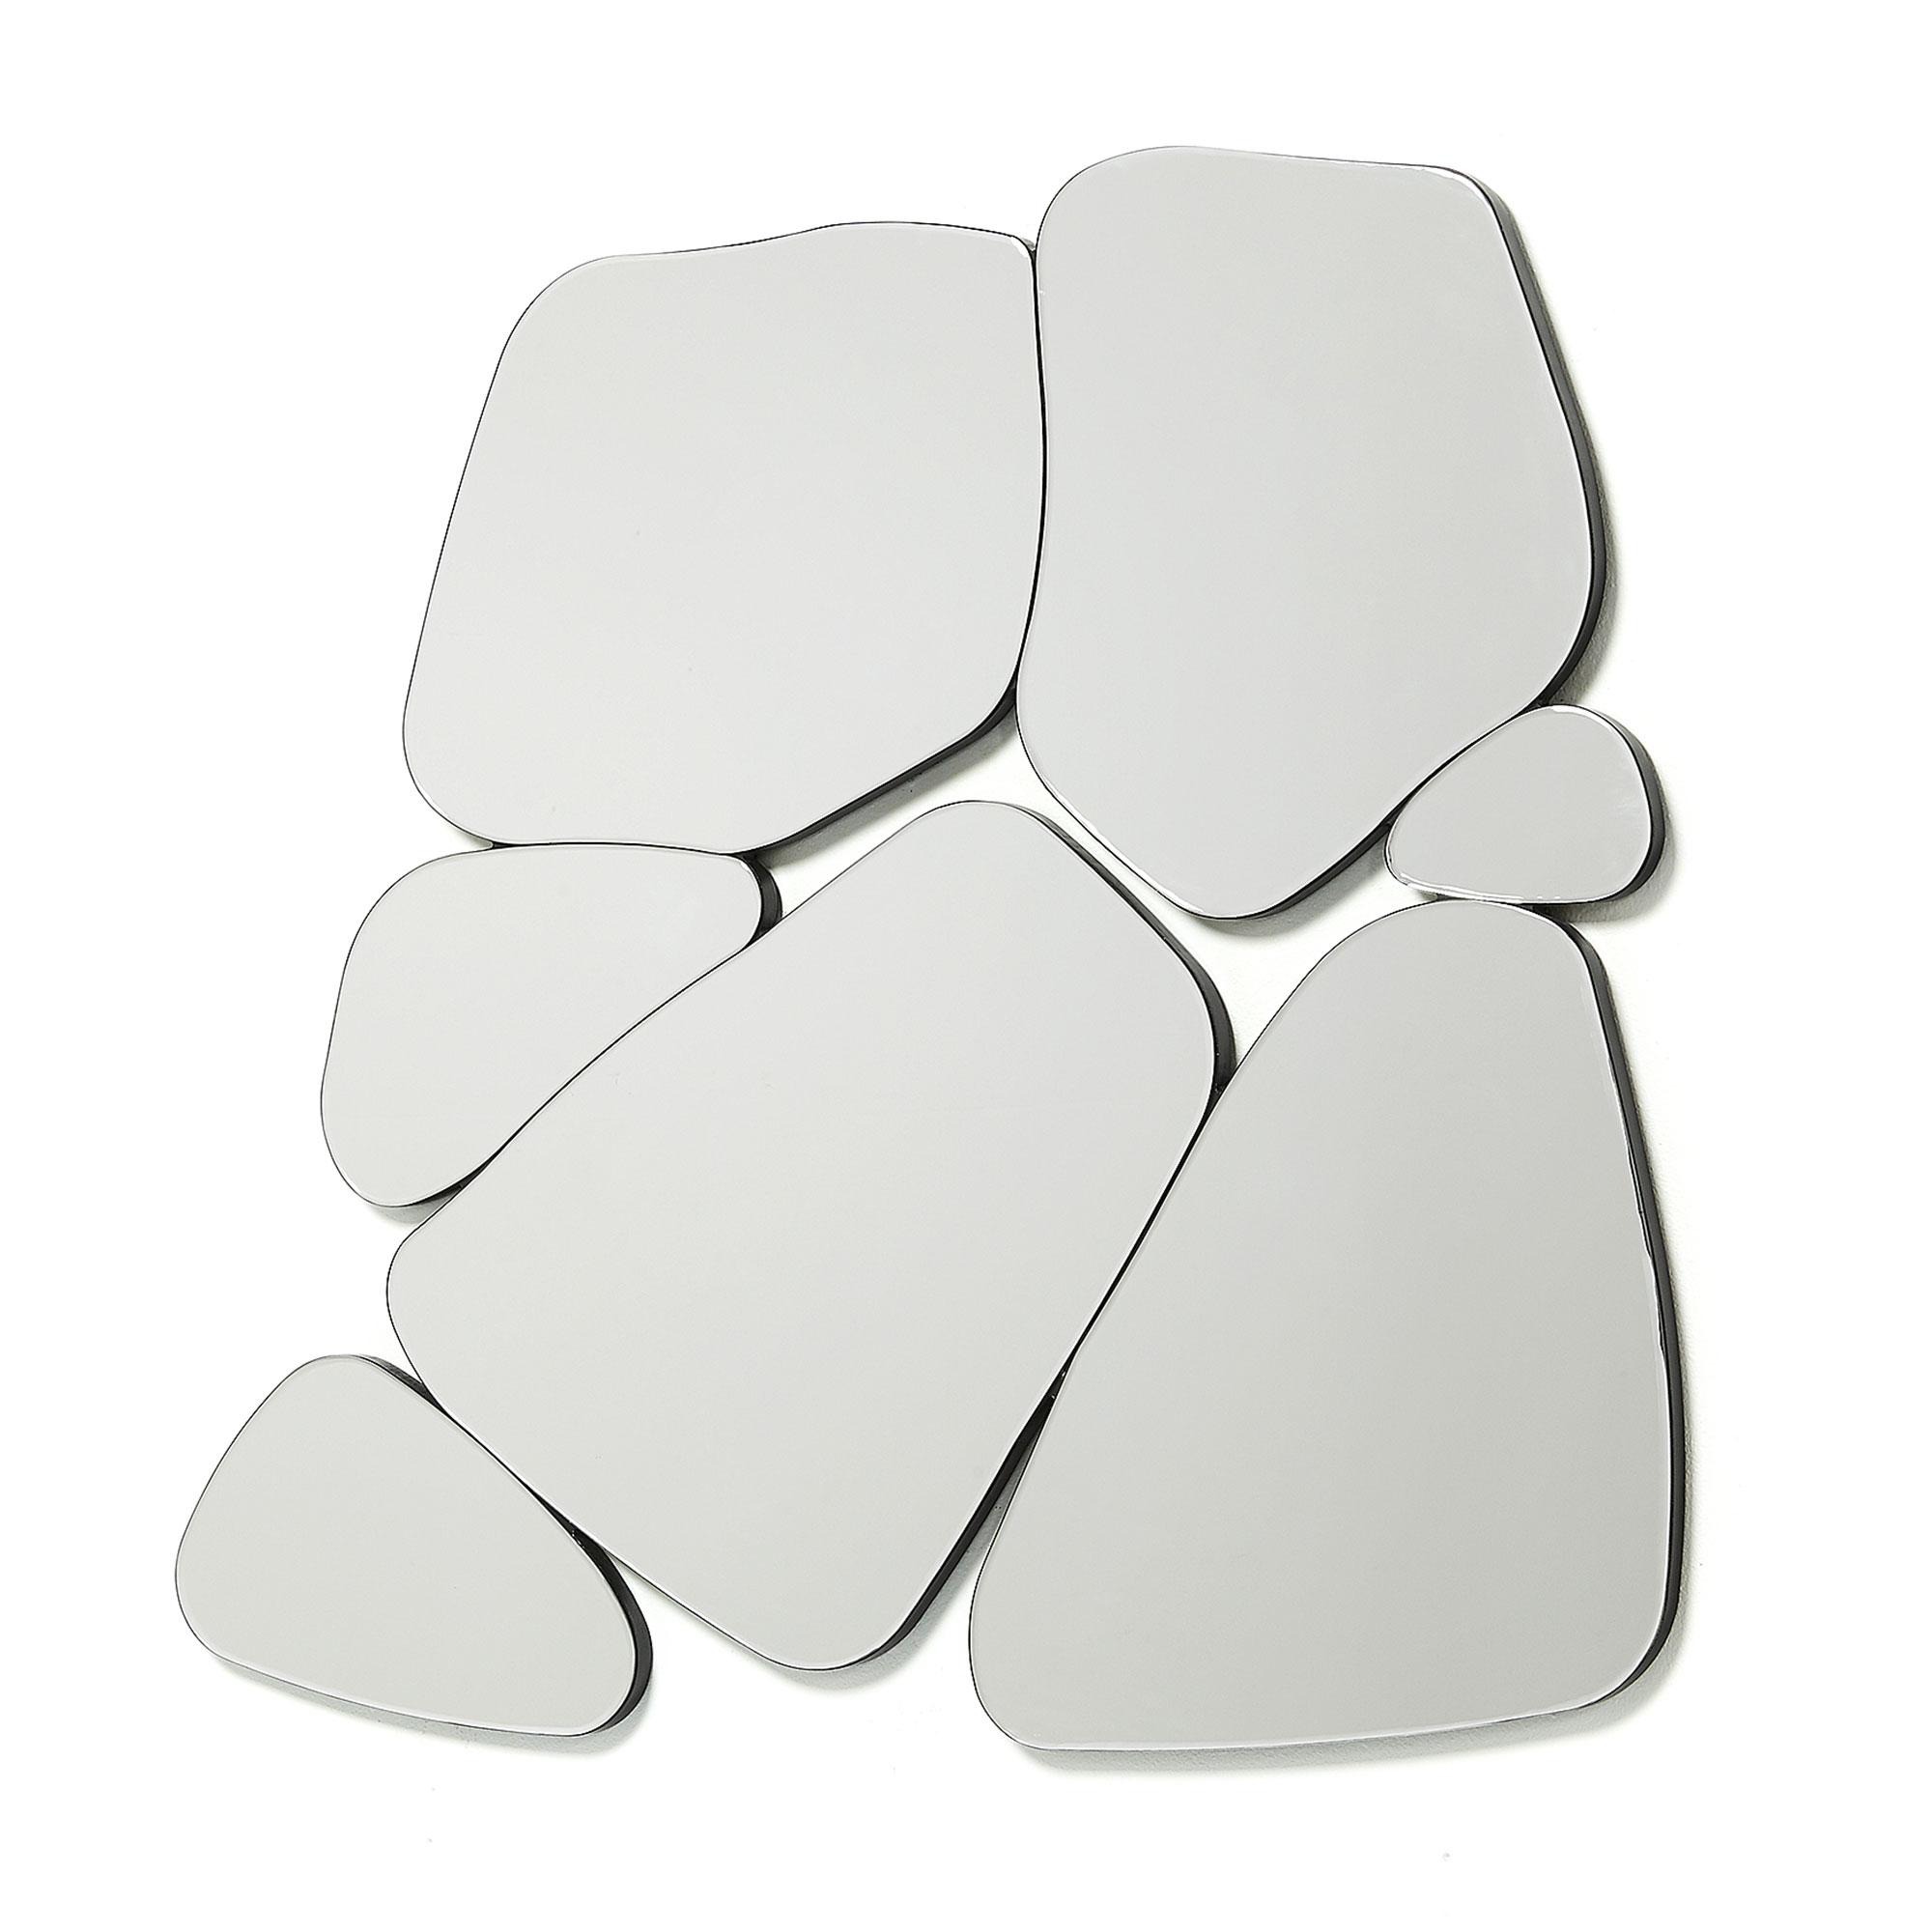 Зеркало stancy (la forma) черный 99x91x2 см.